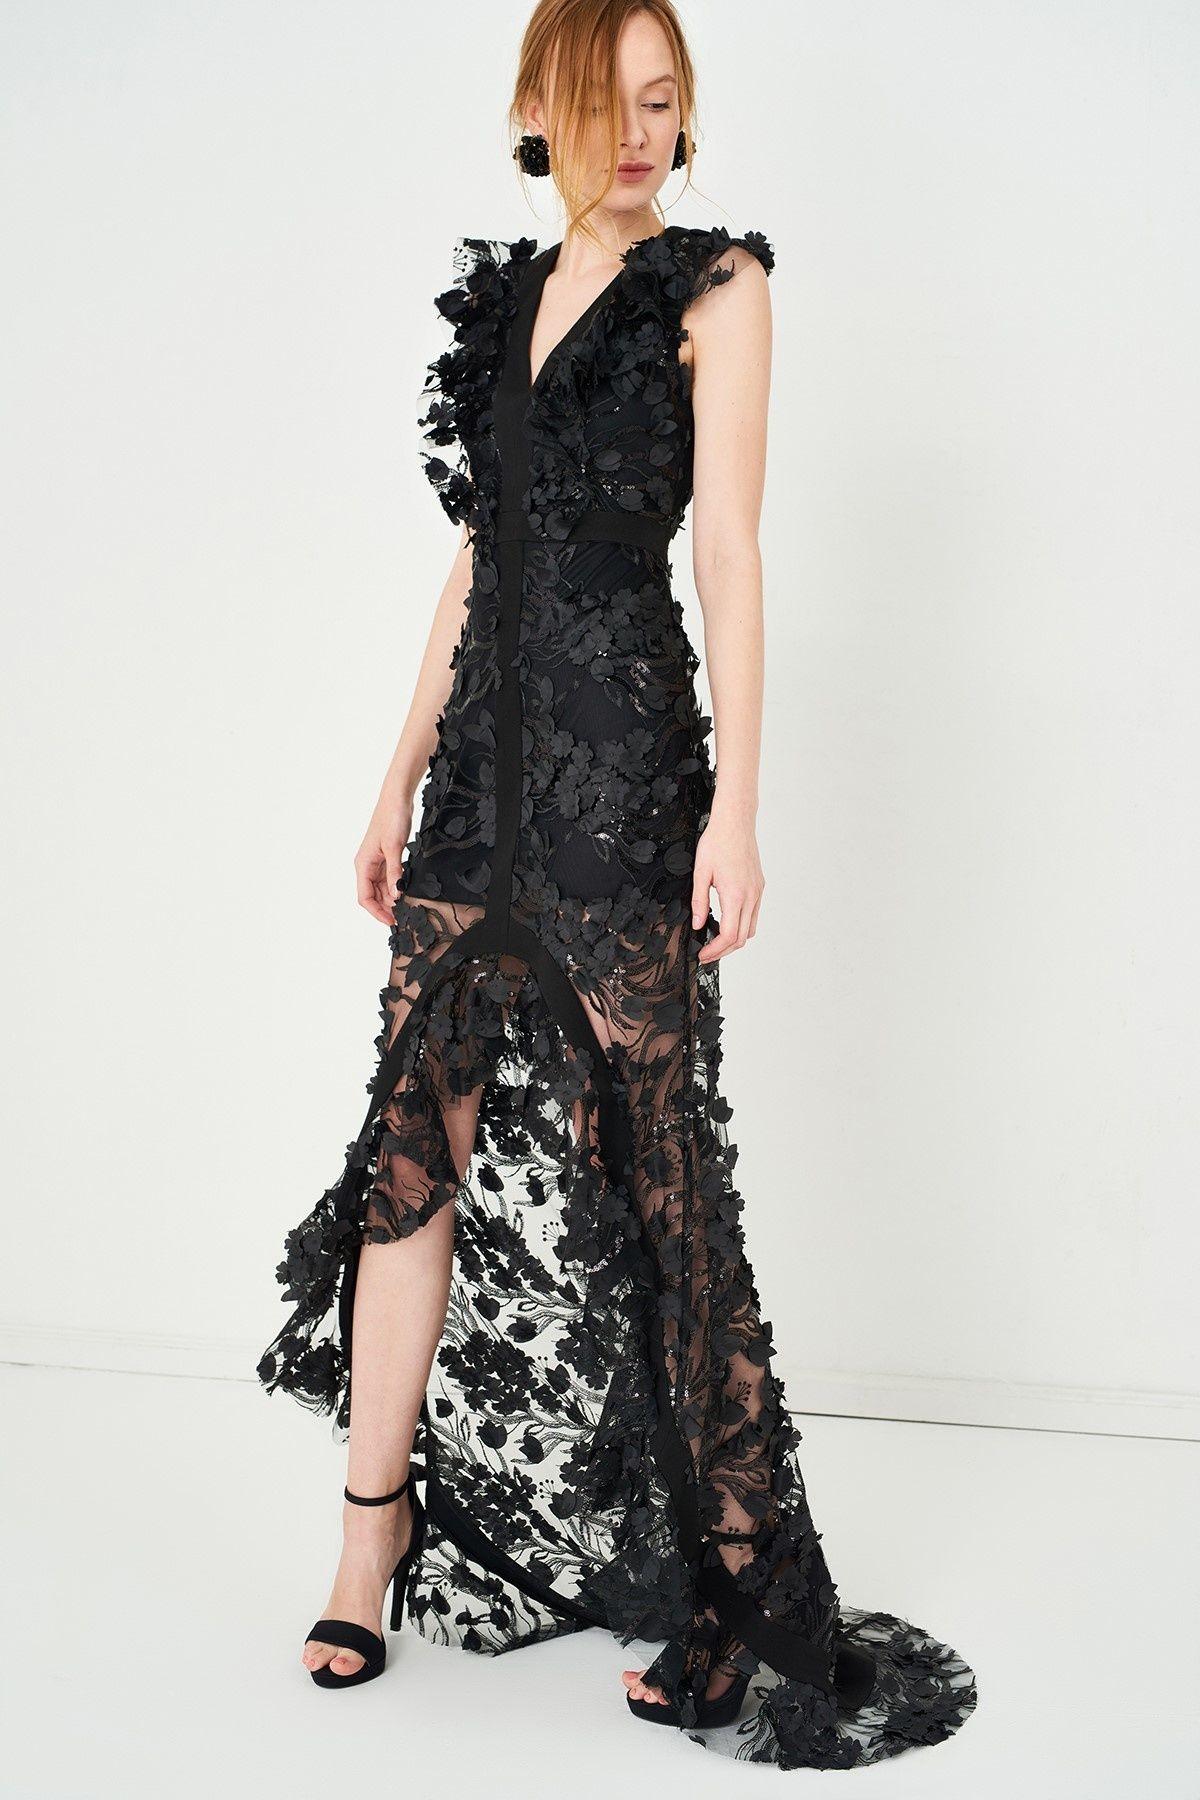 a2a10855449c3 TRENDYOLMİLLA Siyah Üç Boyut Çiçekli Elbise | Glamorous Fashion ...